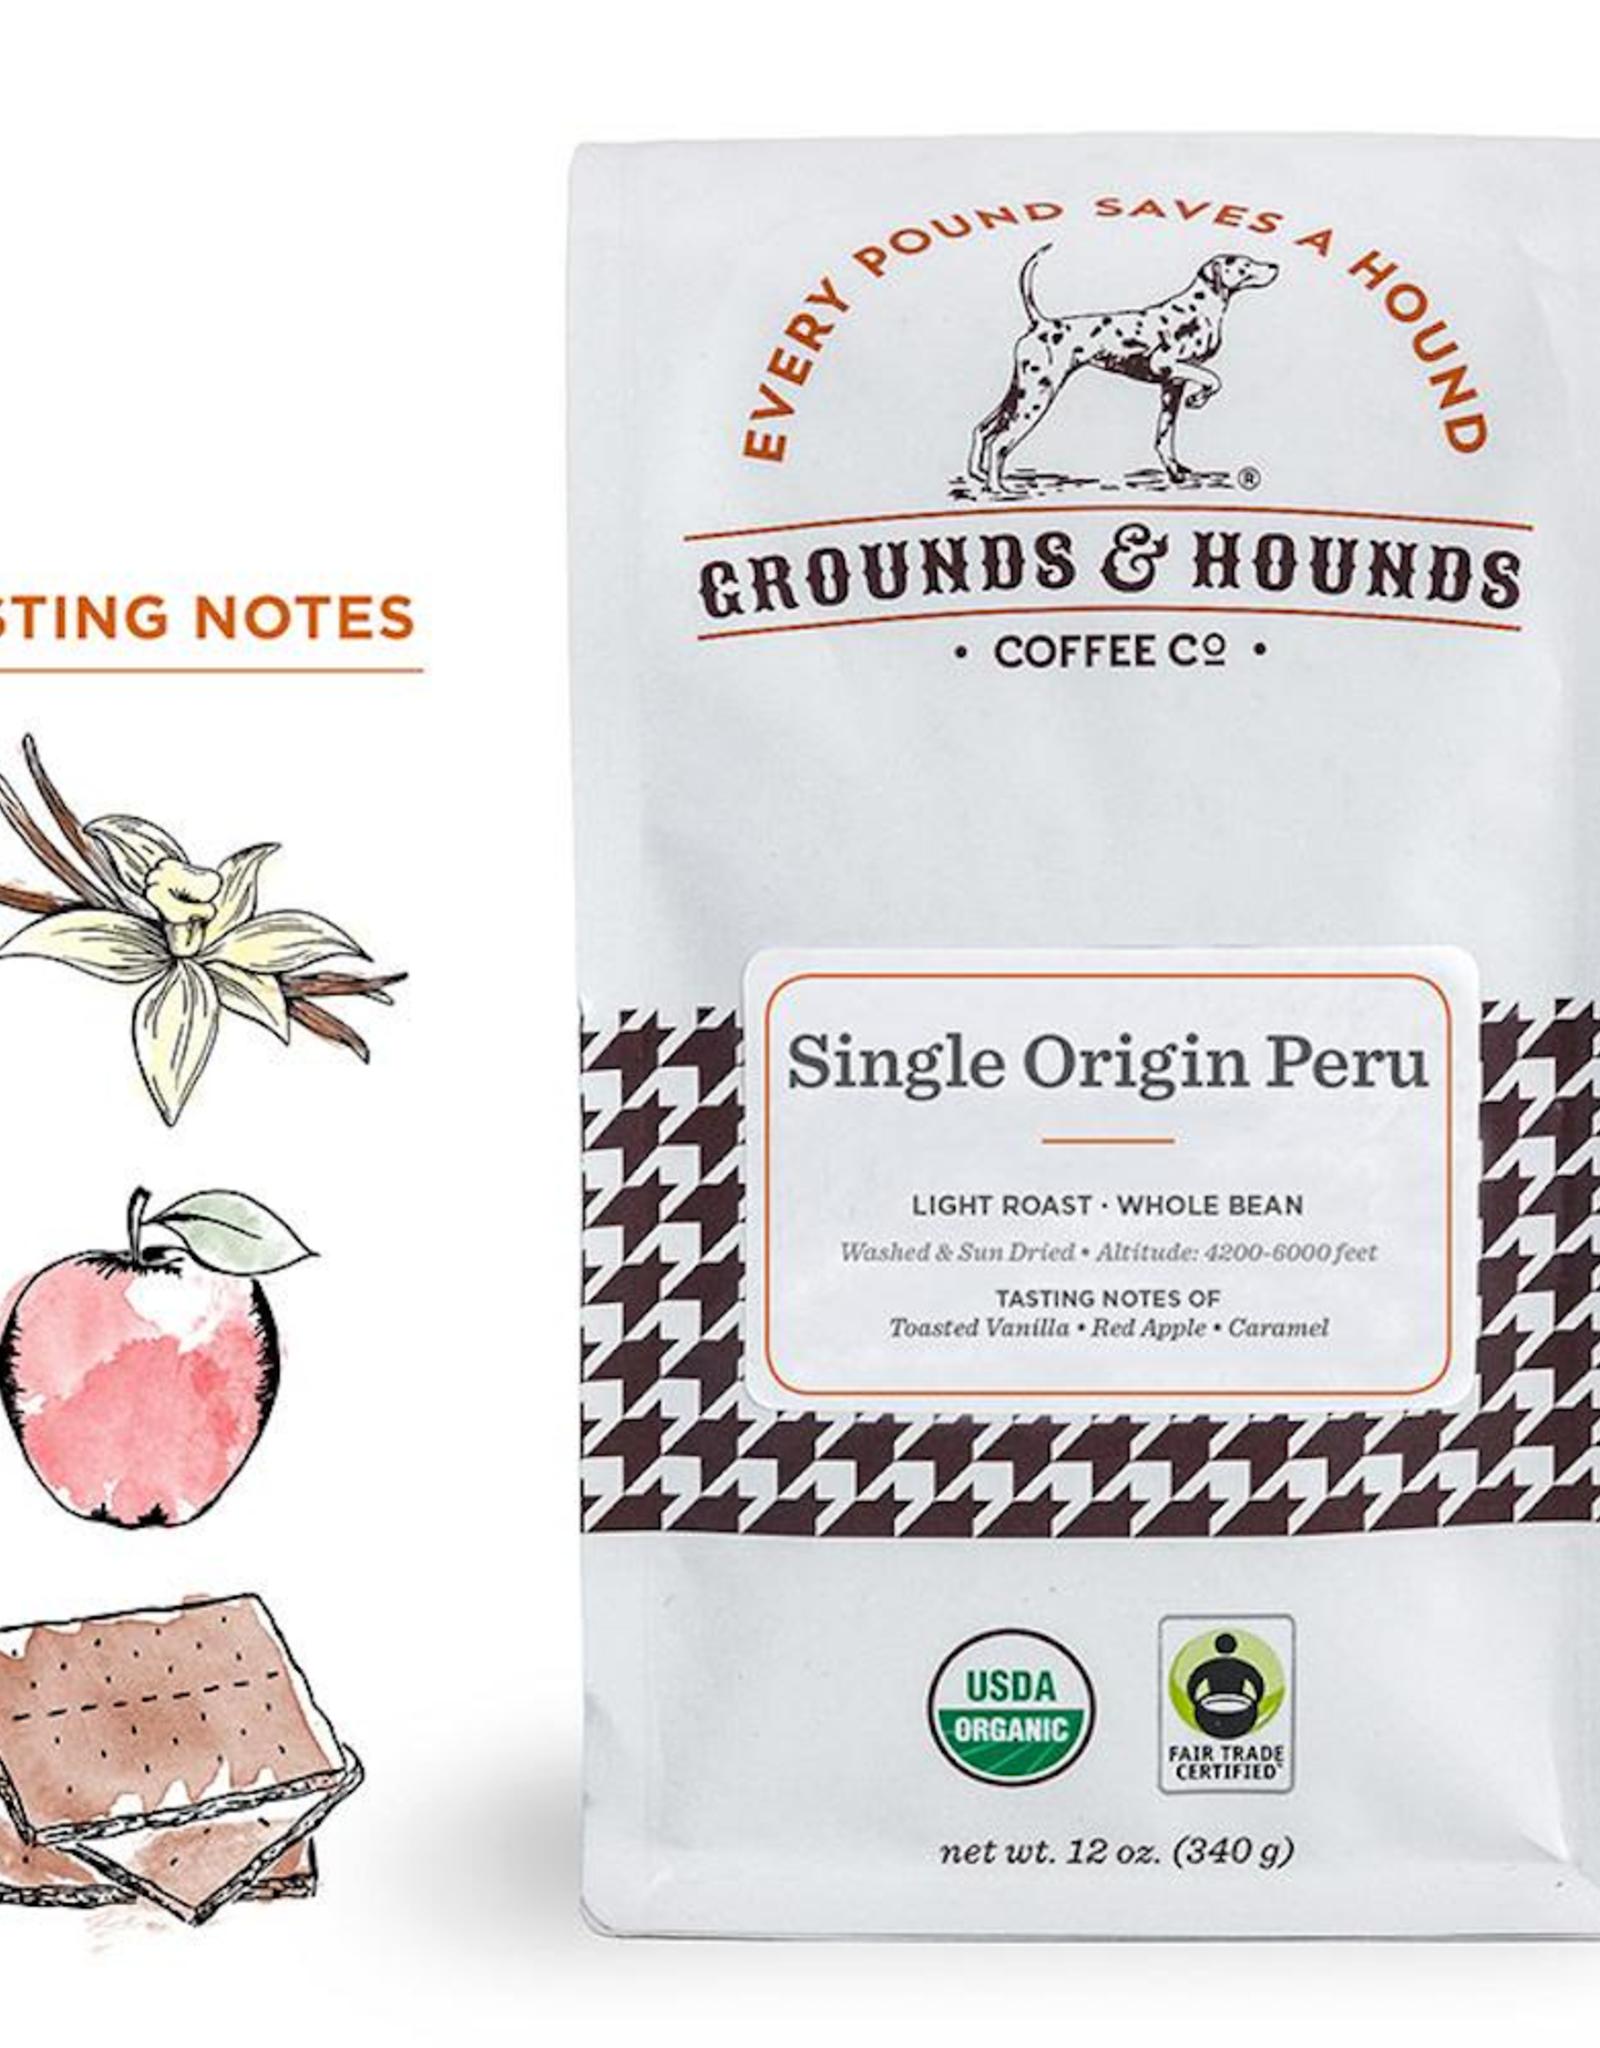 Grounds & Hounds Whole Bean Coffee Peru